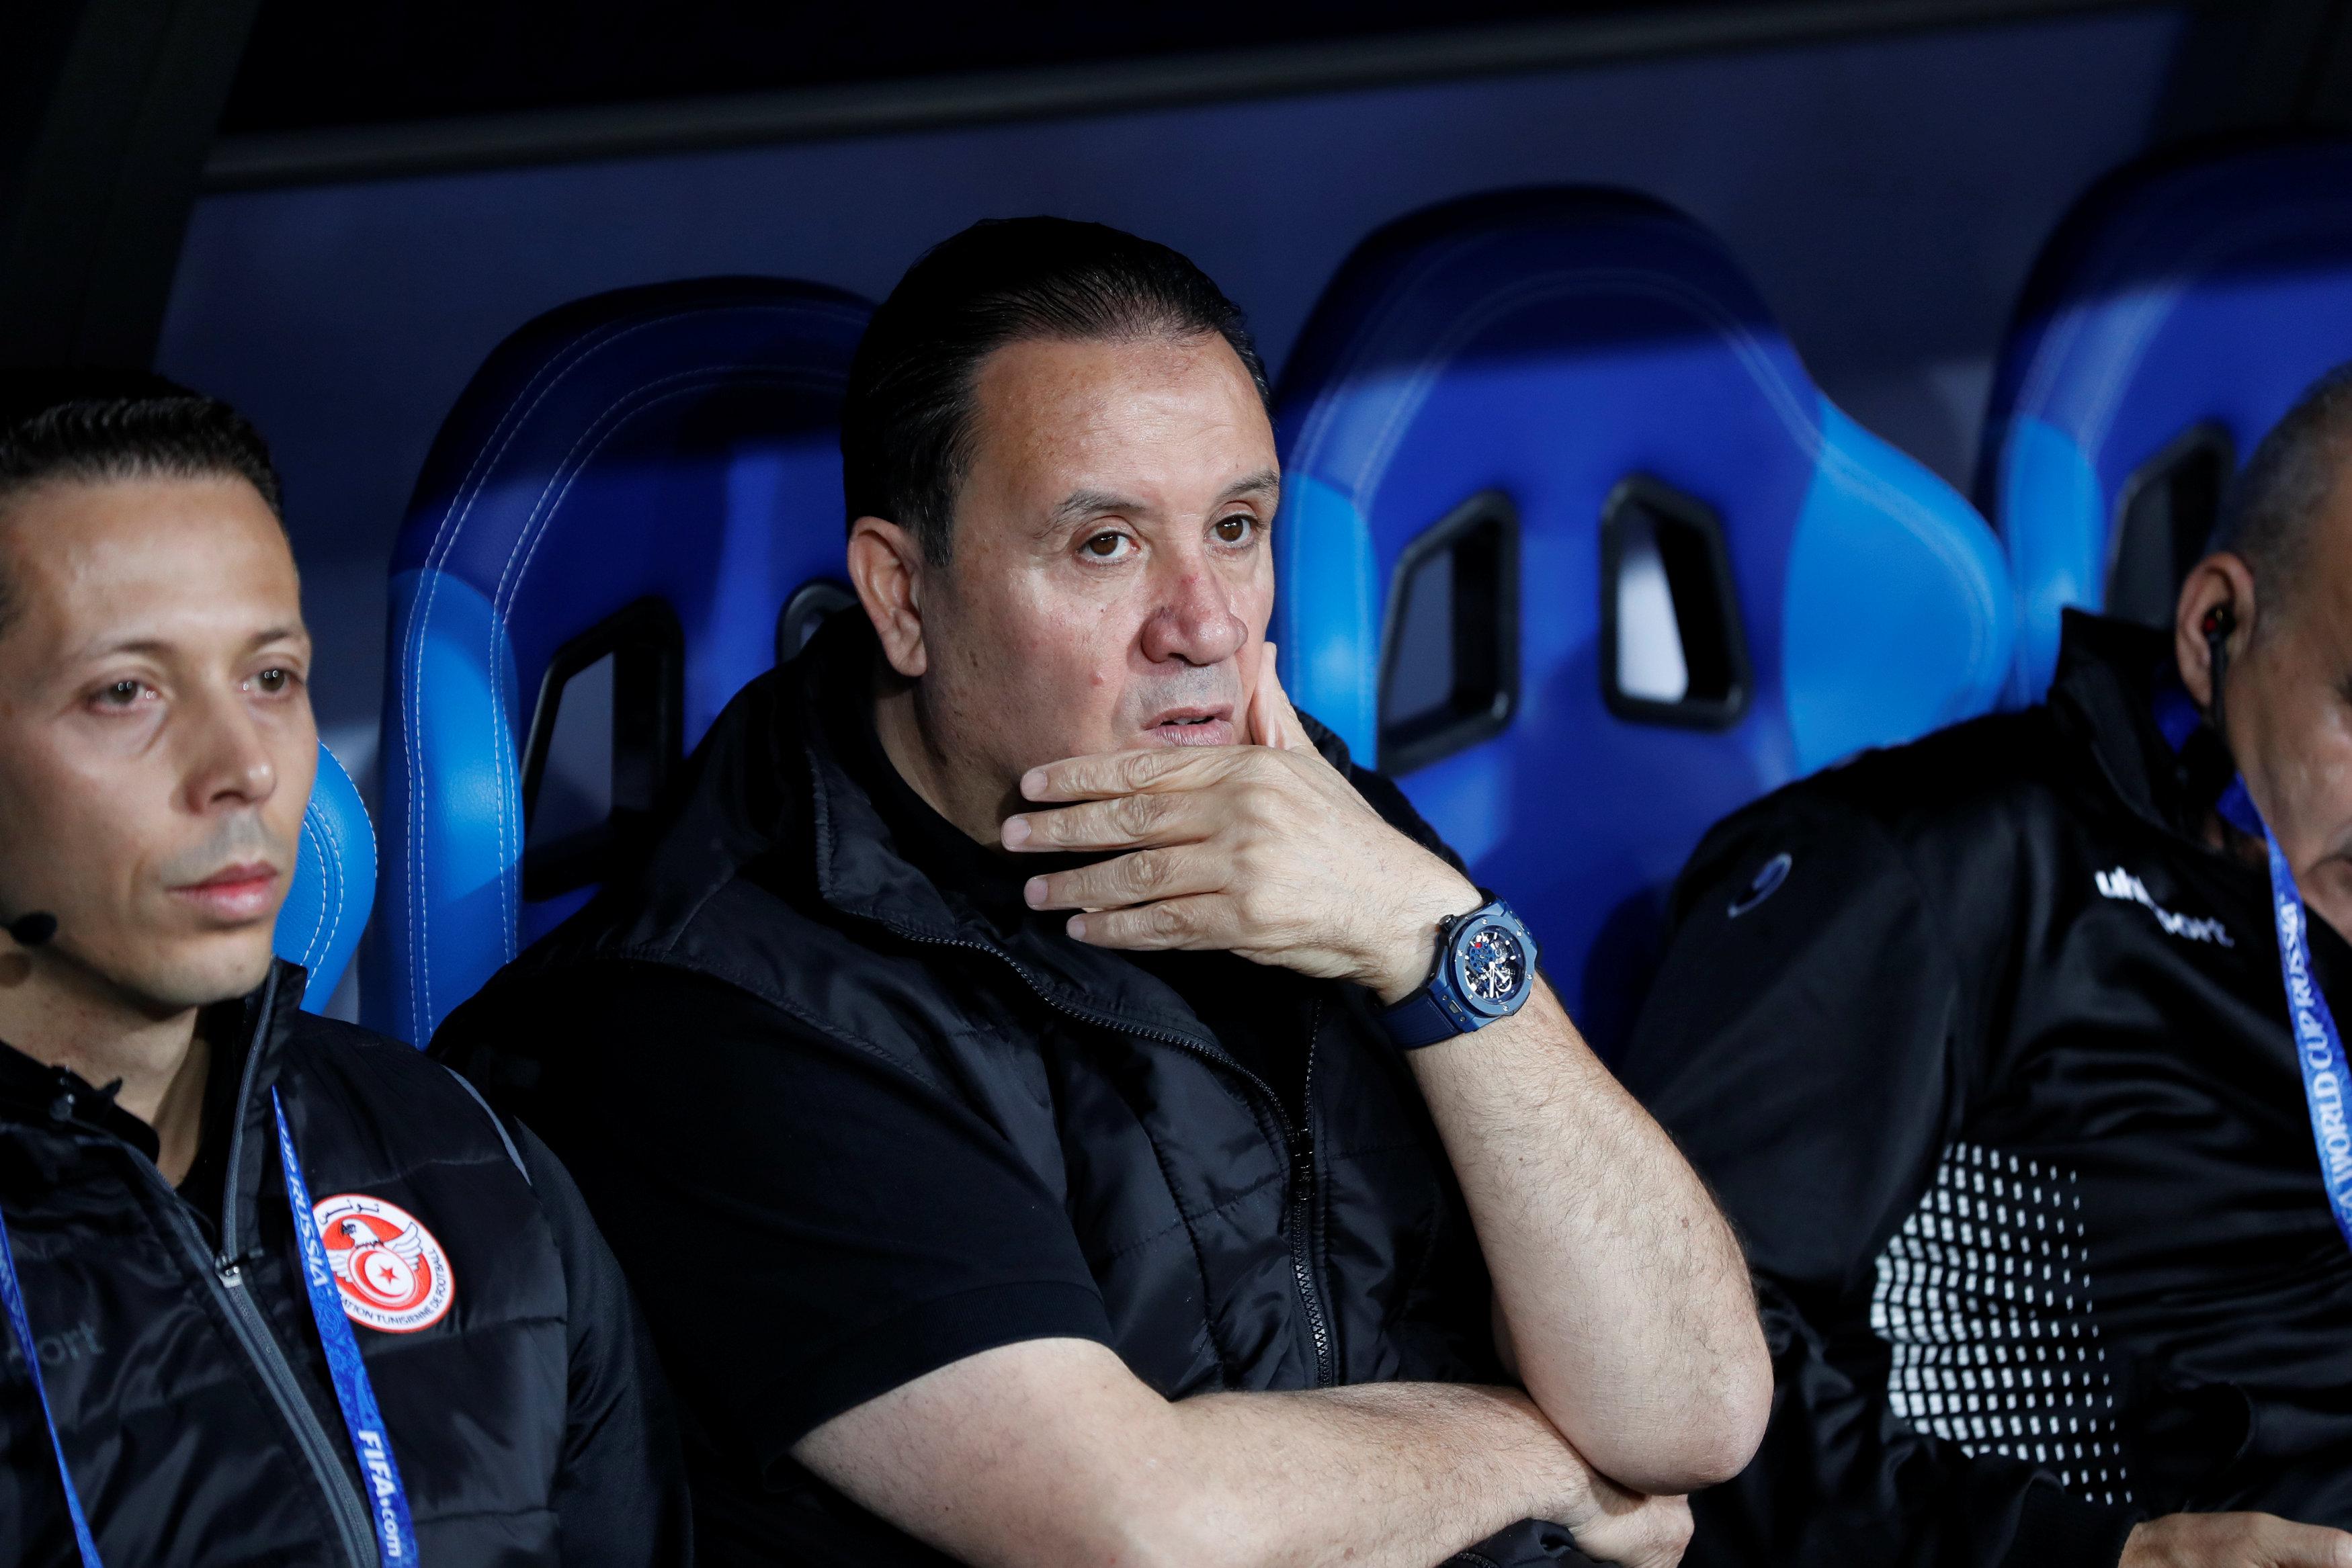 Tunisia coach rues influence of 'optimal striker' Kane   The